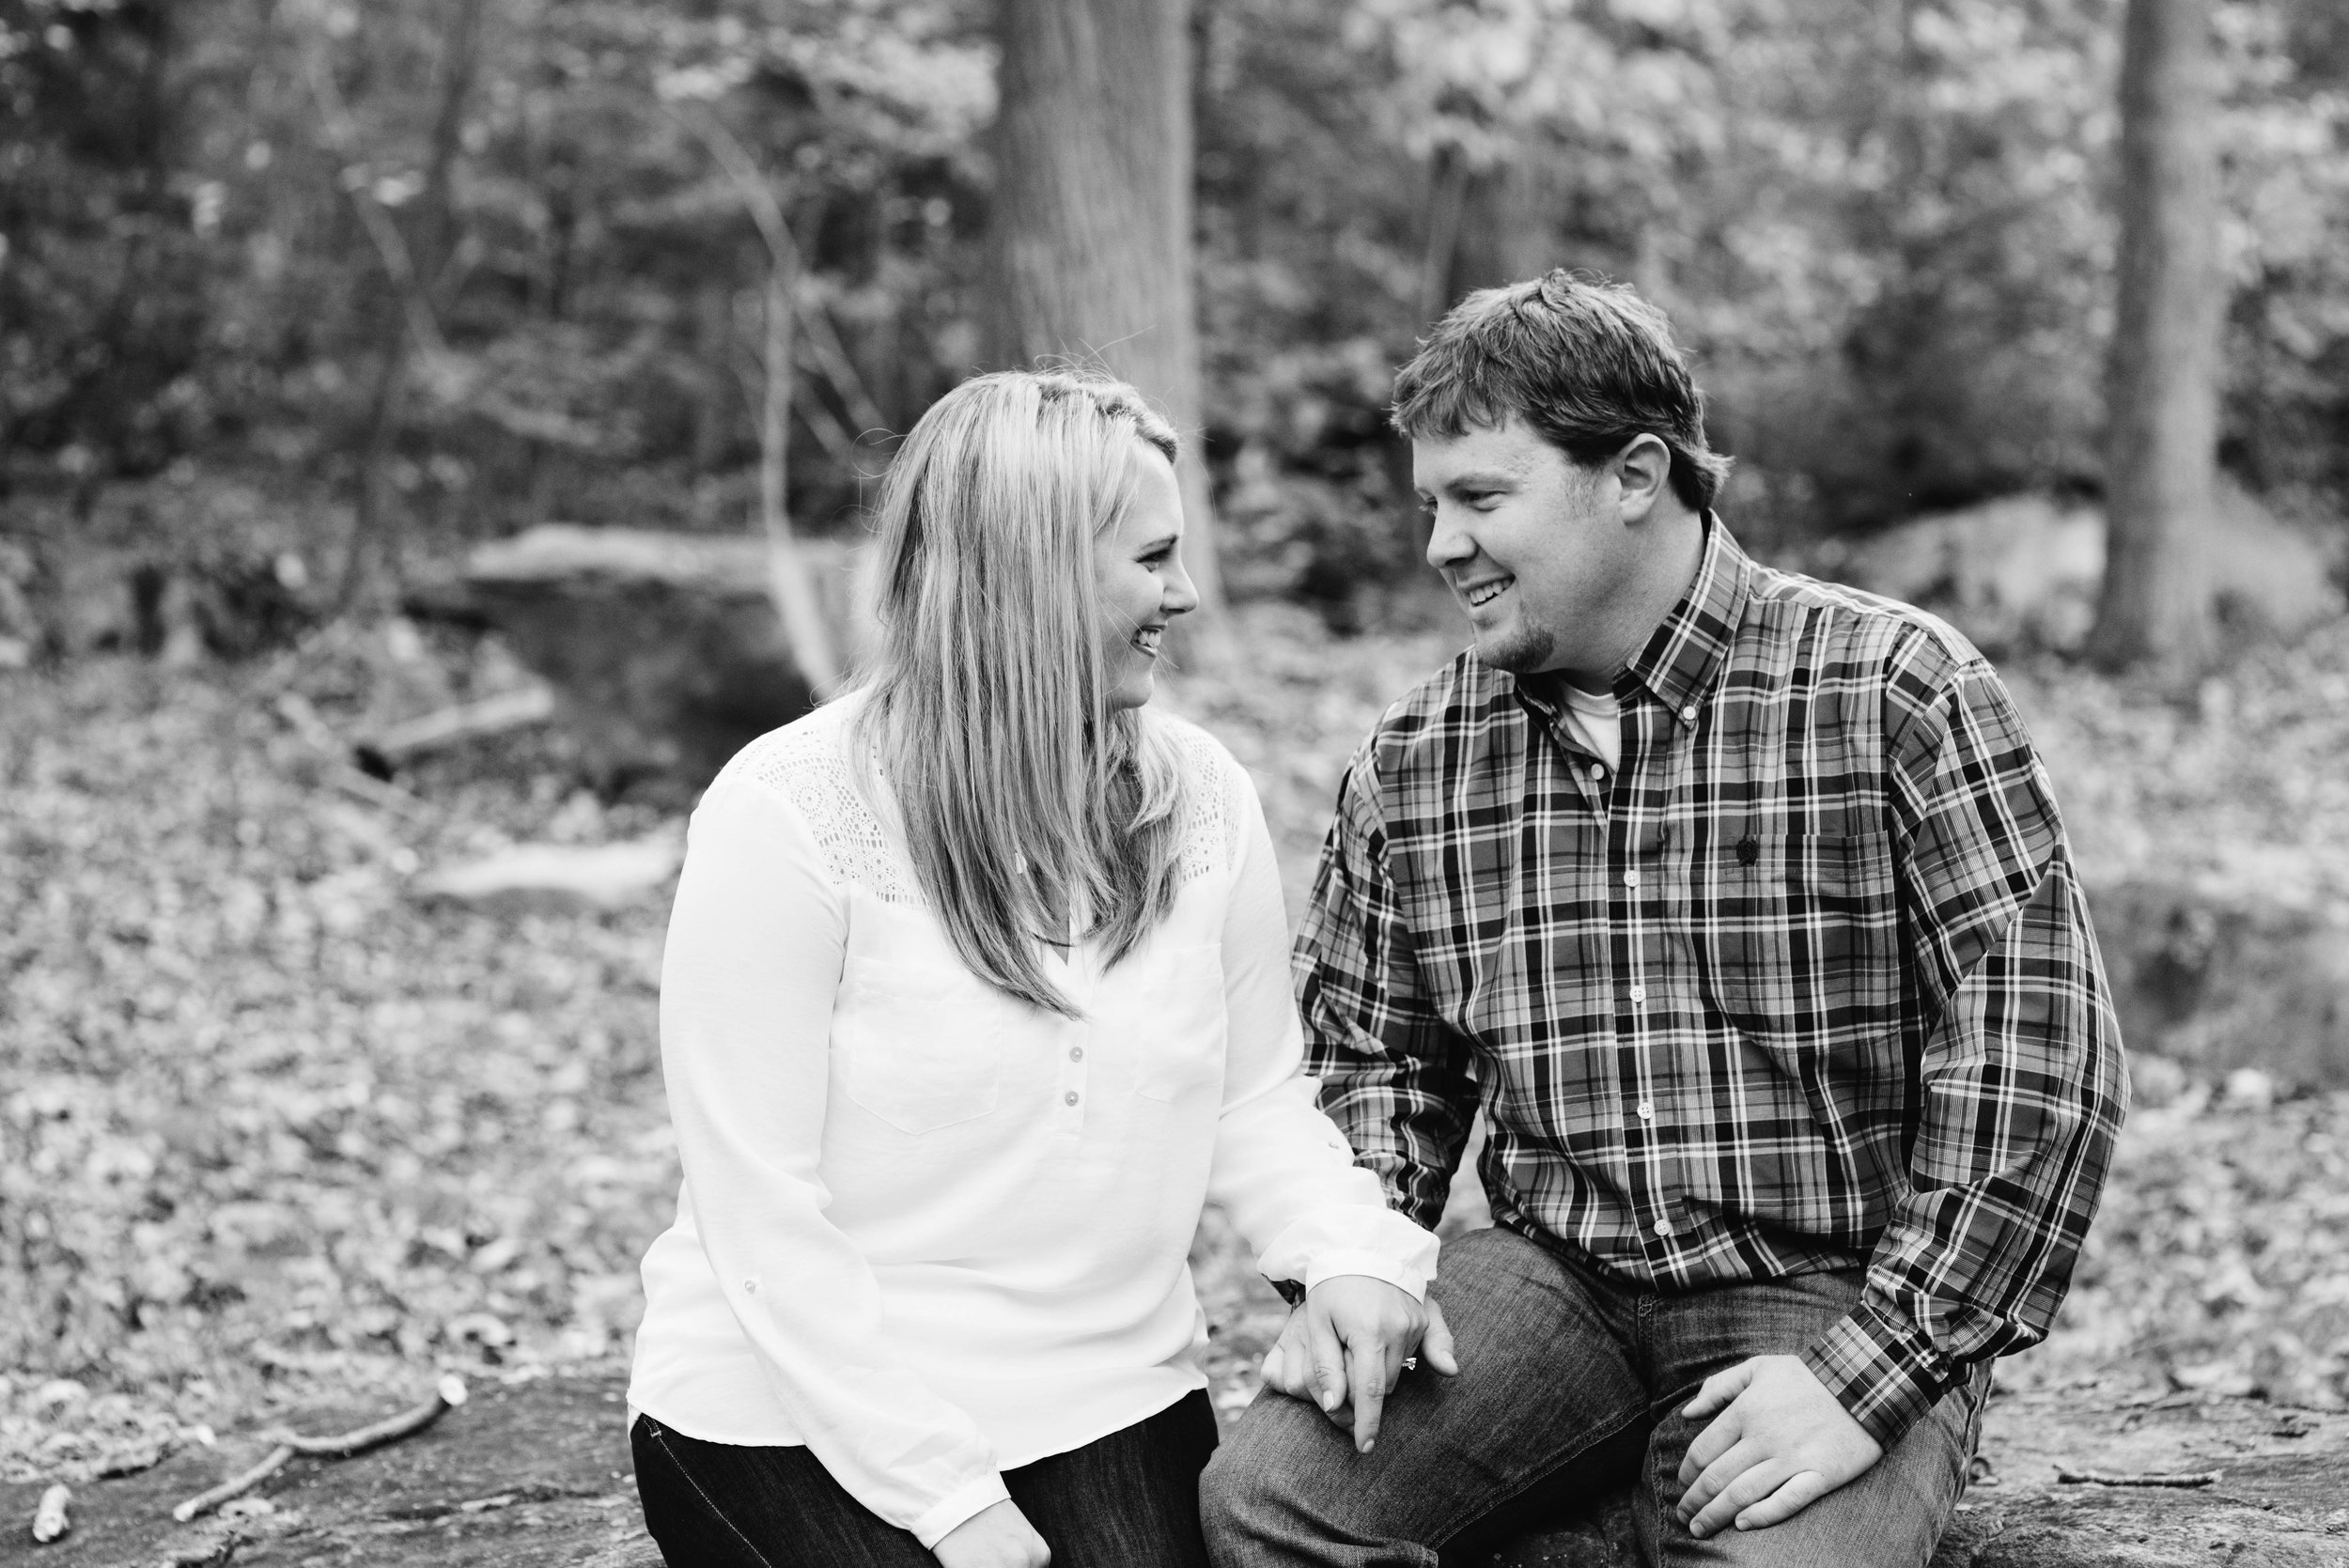 Linn Run Engagement session mariah fisher photography.jpg